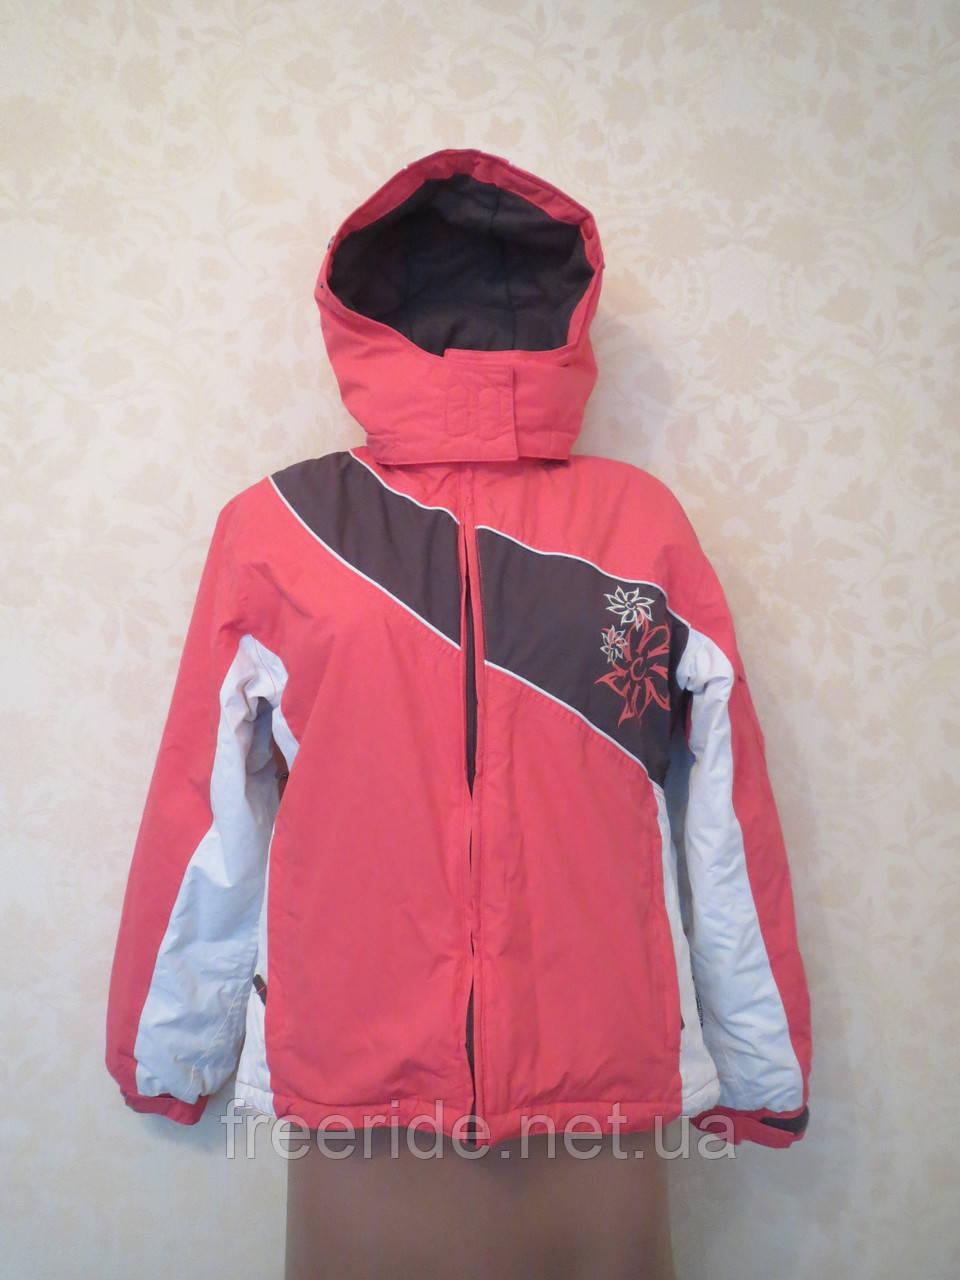 Лыжная куртка Alive (164)